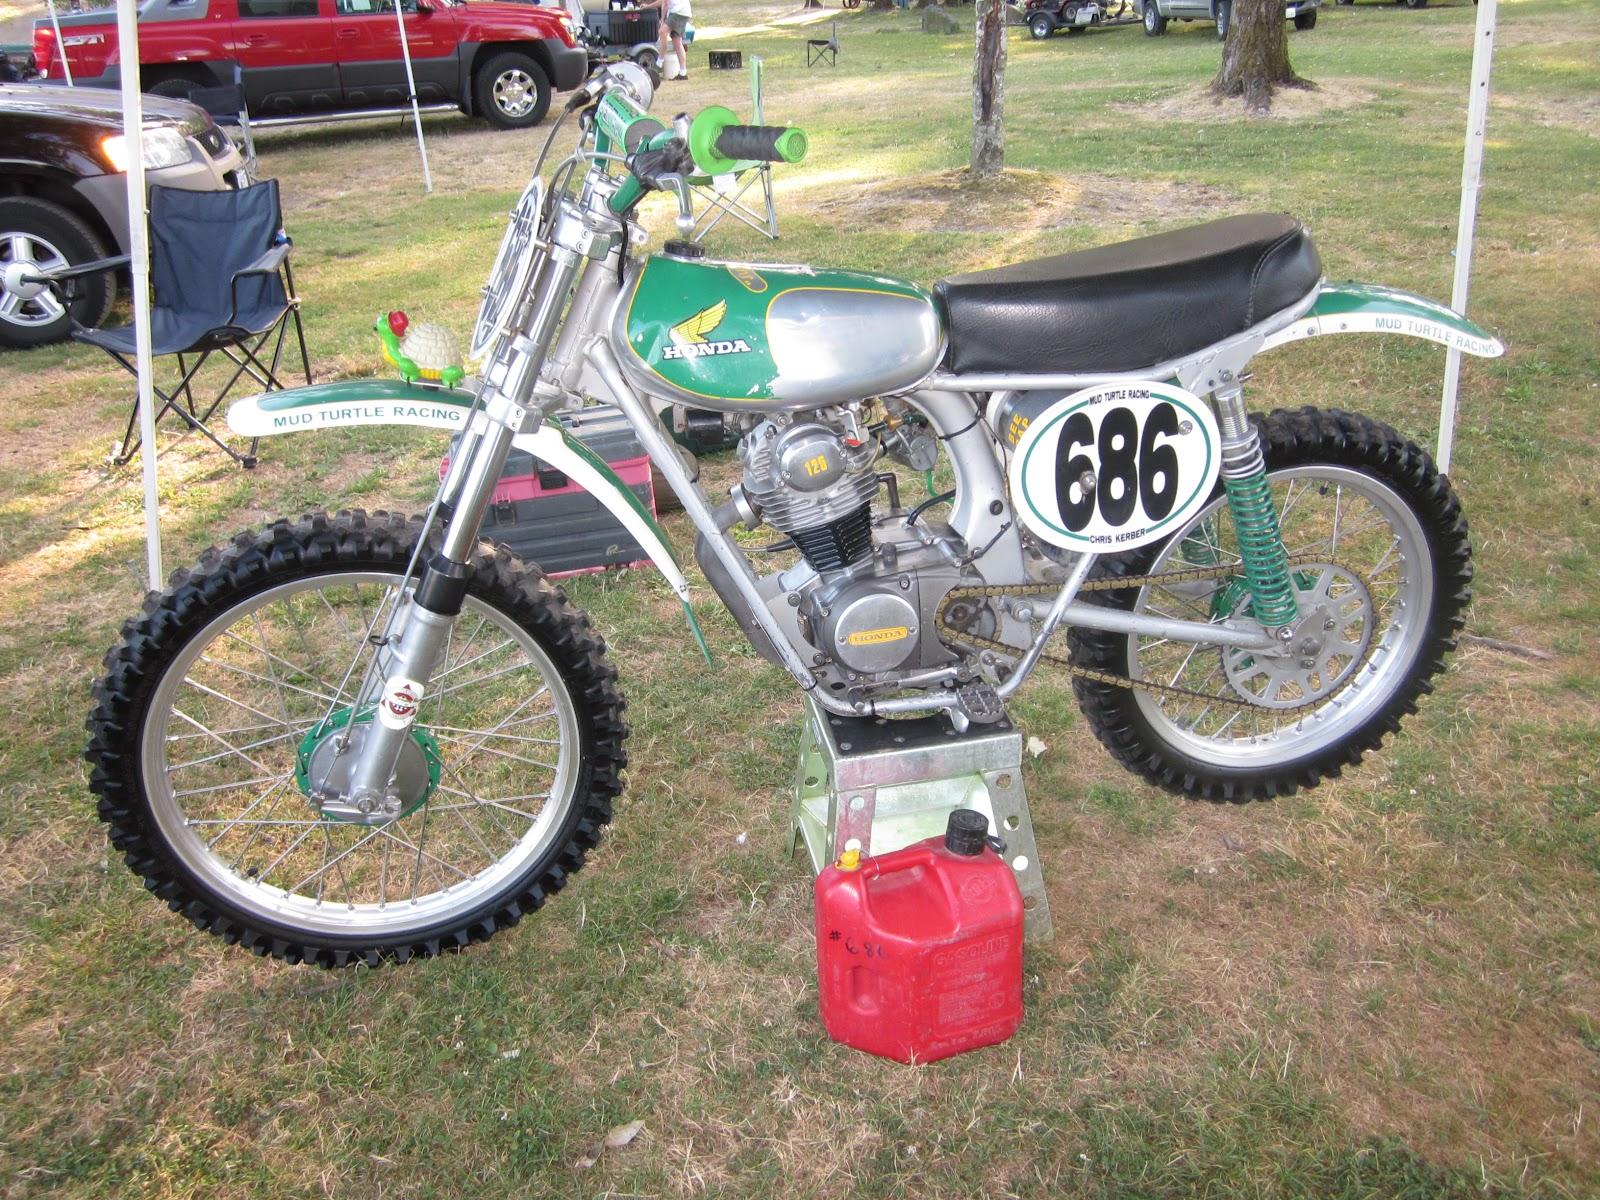 Vintage Roost - Vintage Motocross Parts